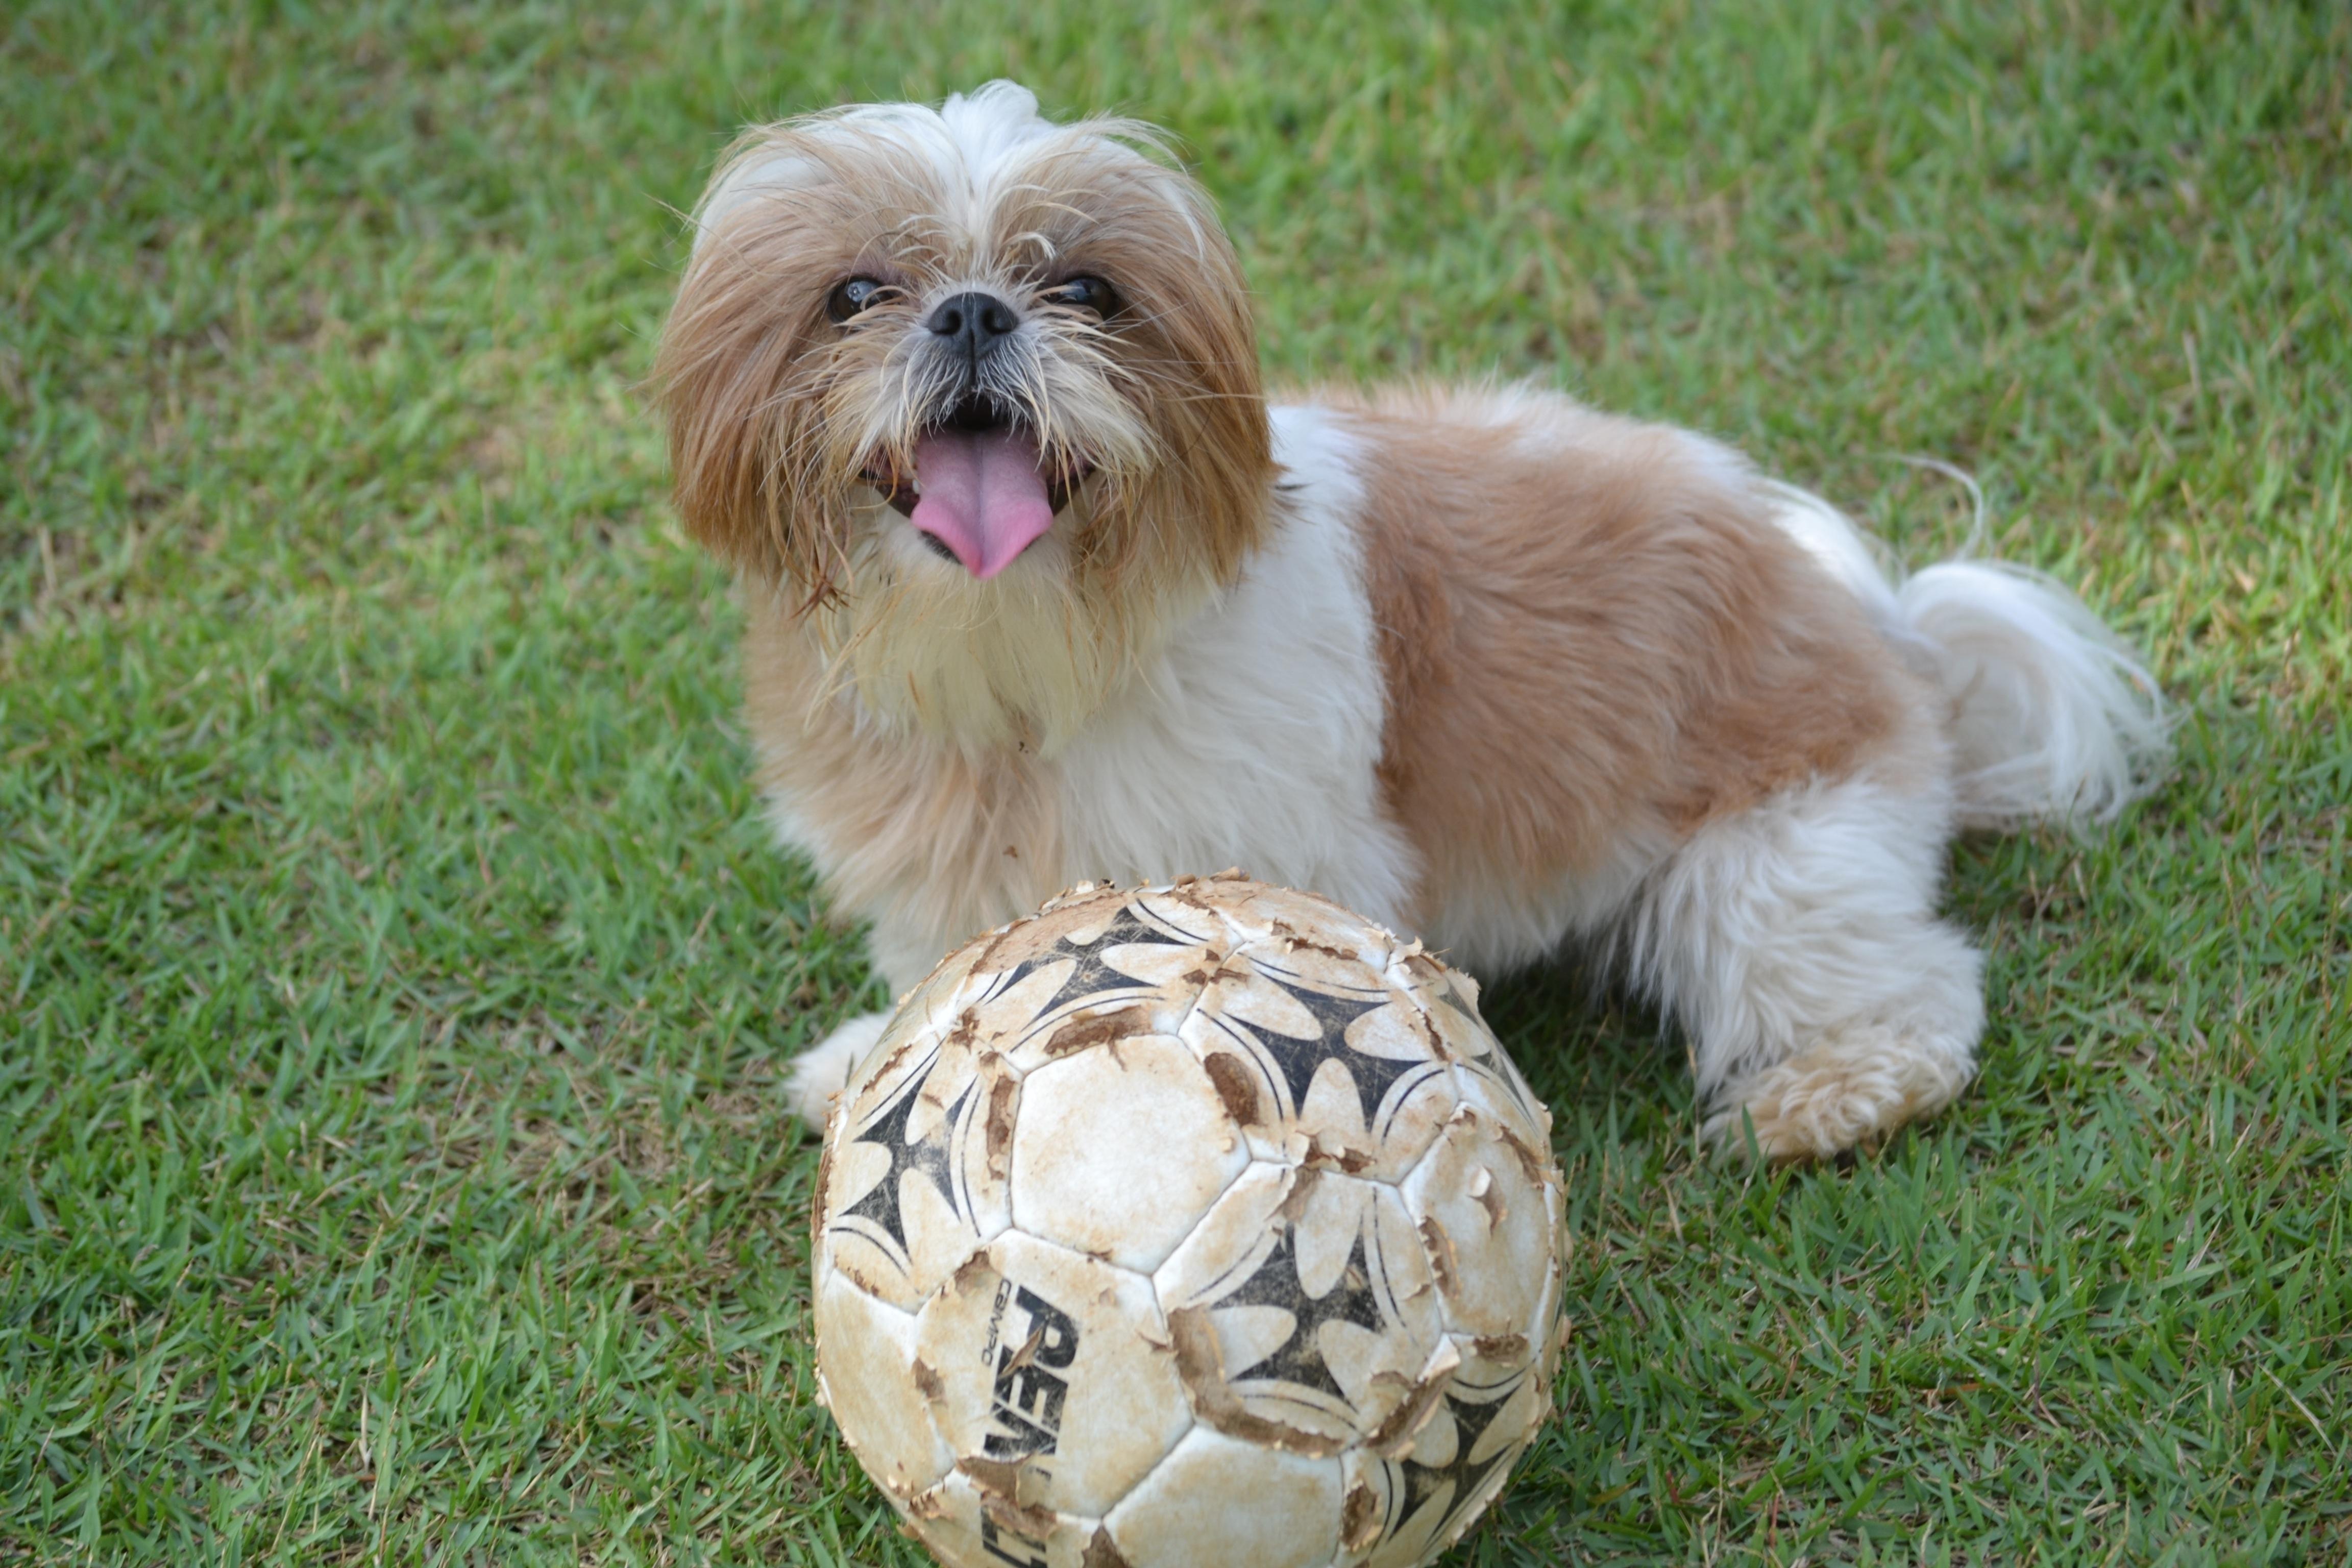 Free Images : Grass, Animal, Ball, Hairy, Vertebrate, Dog